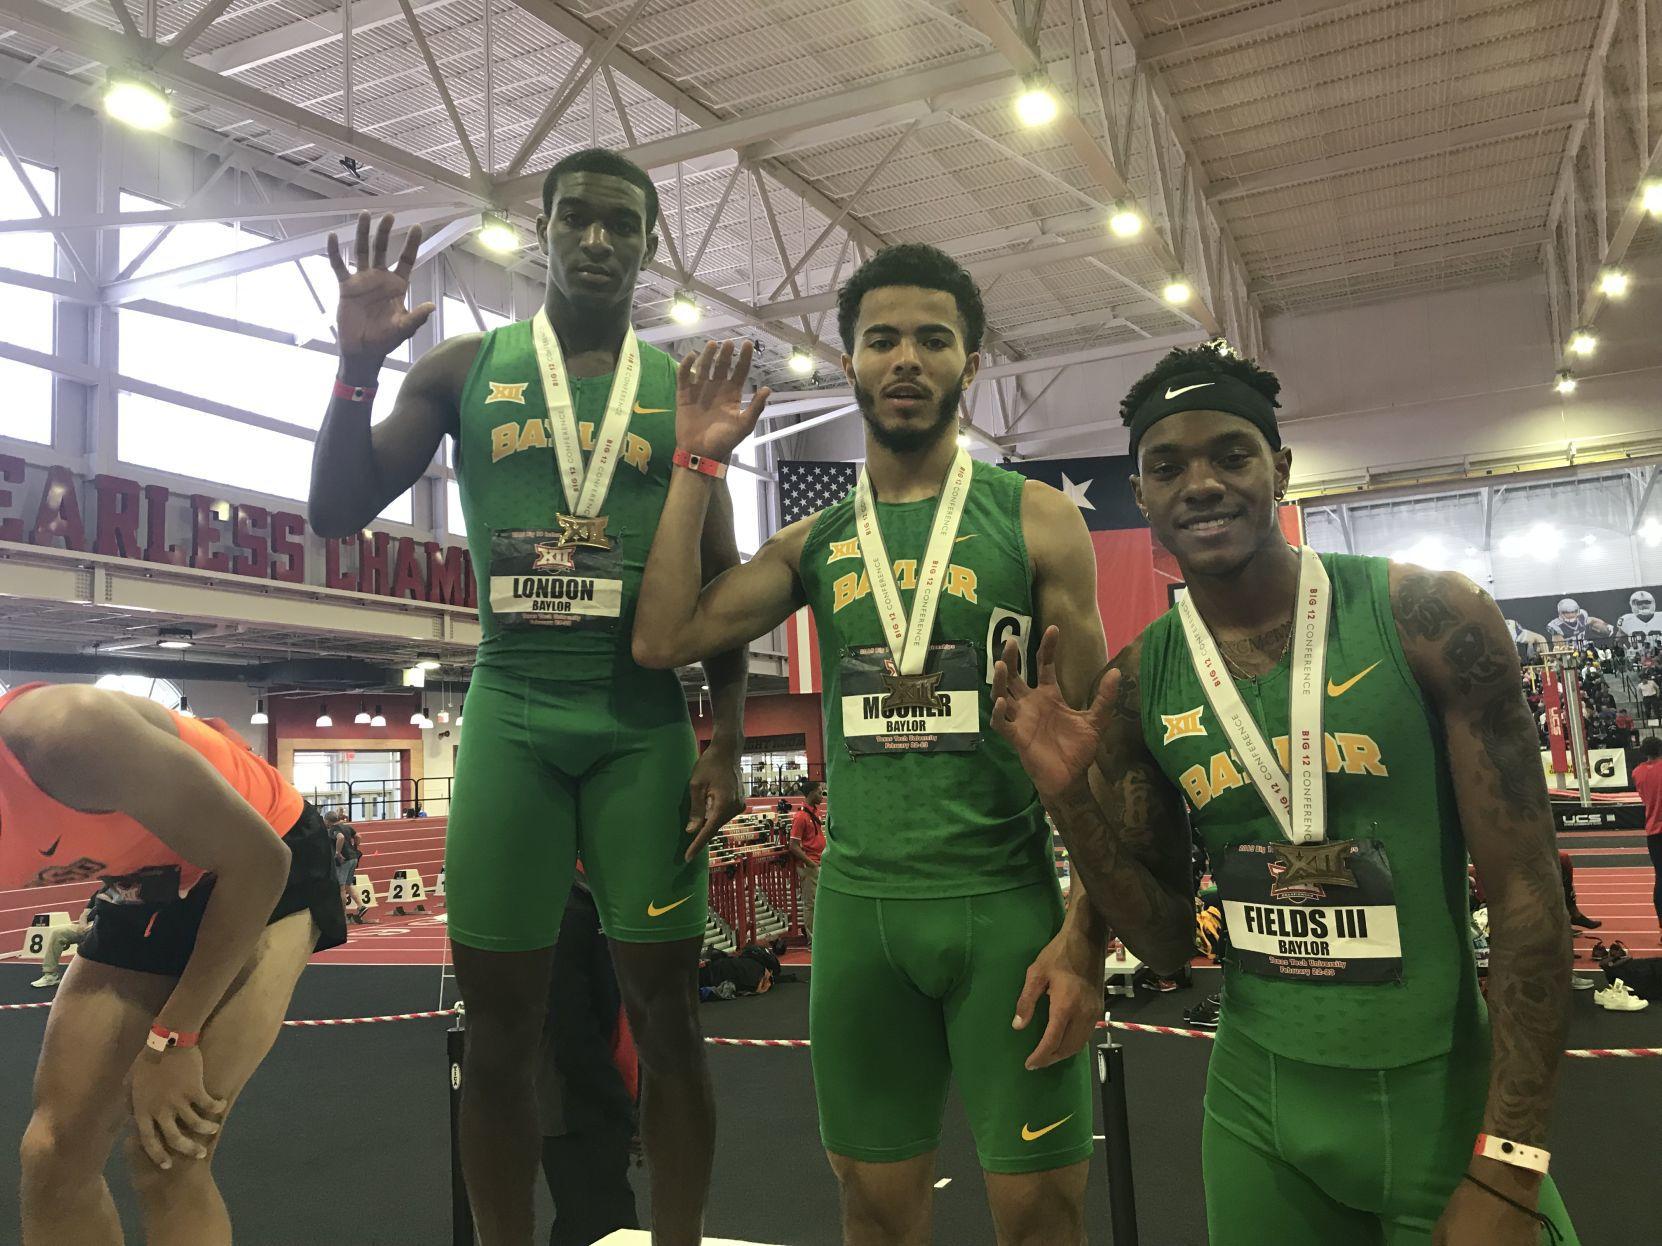 BU men's 400 meter winners (copy)